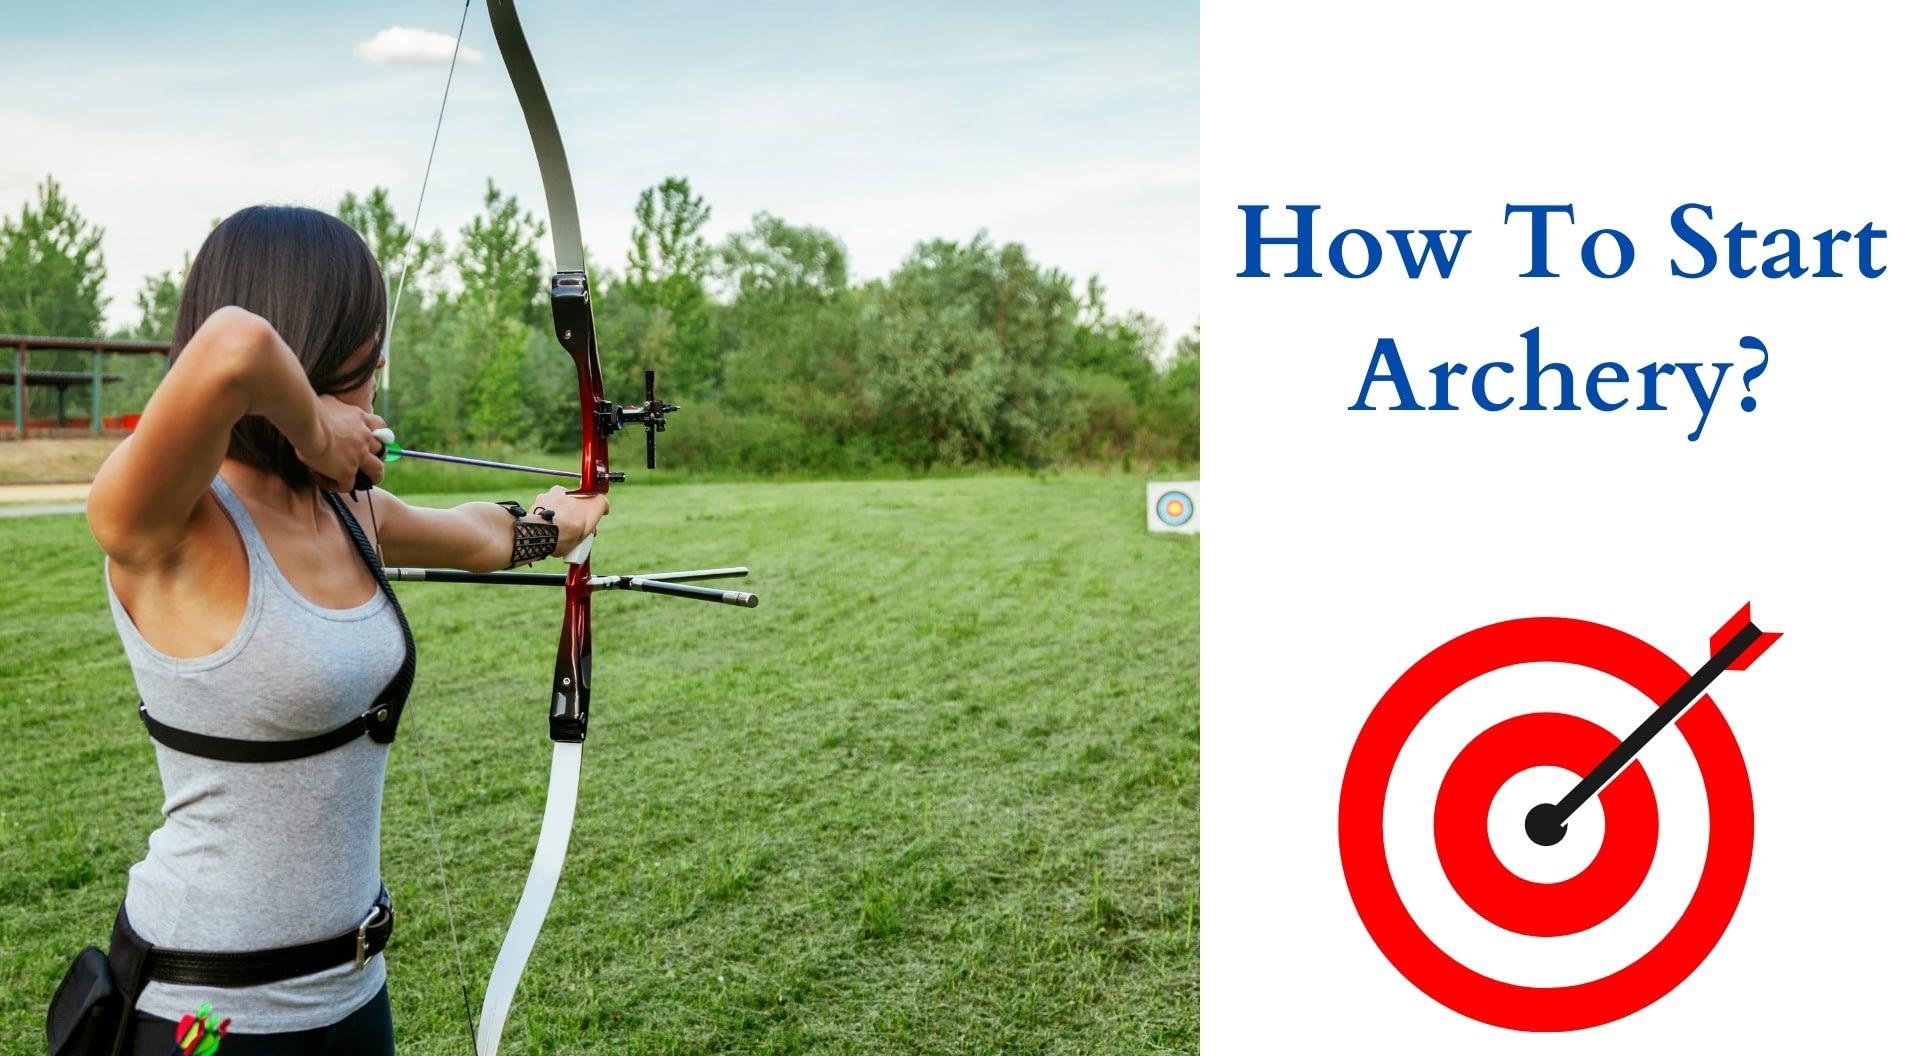 How To Start Archery